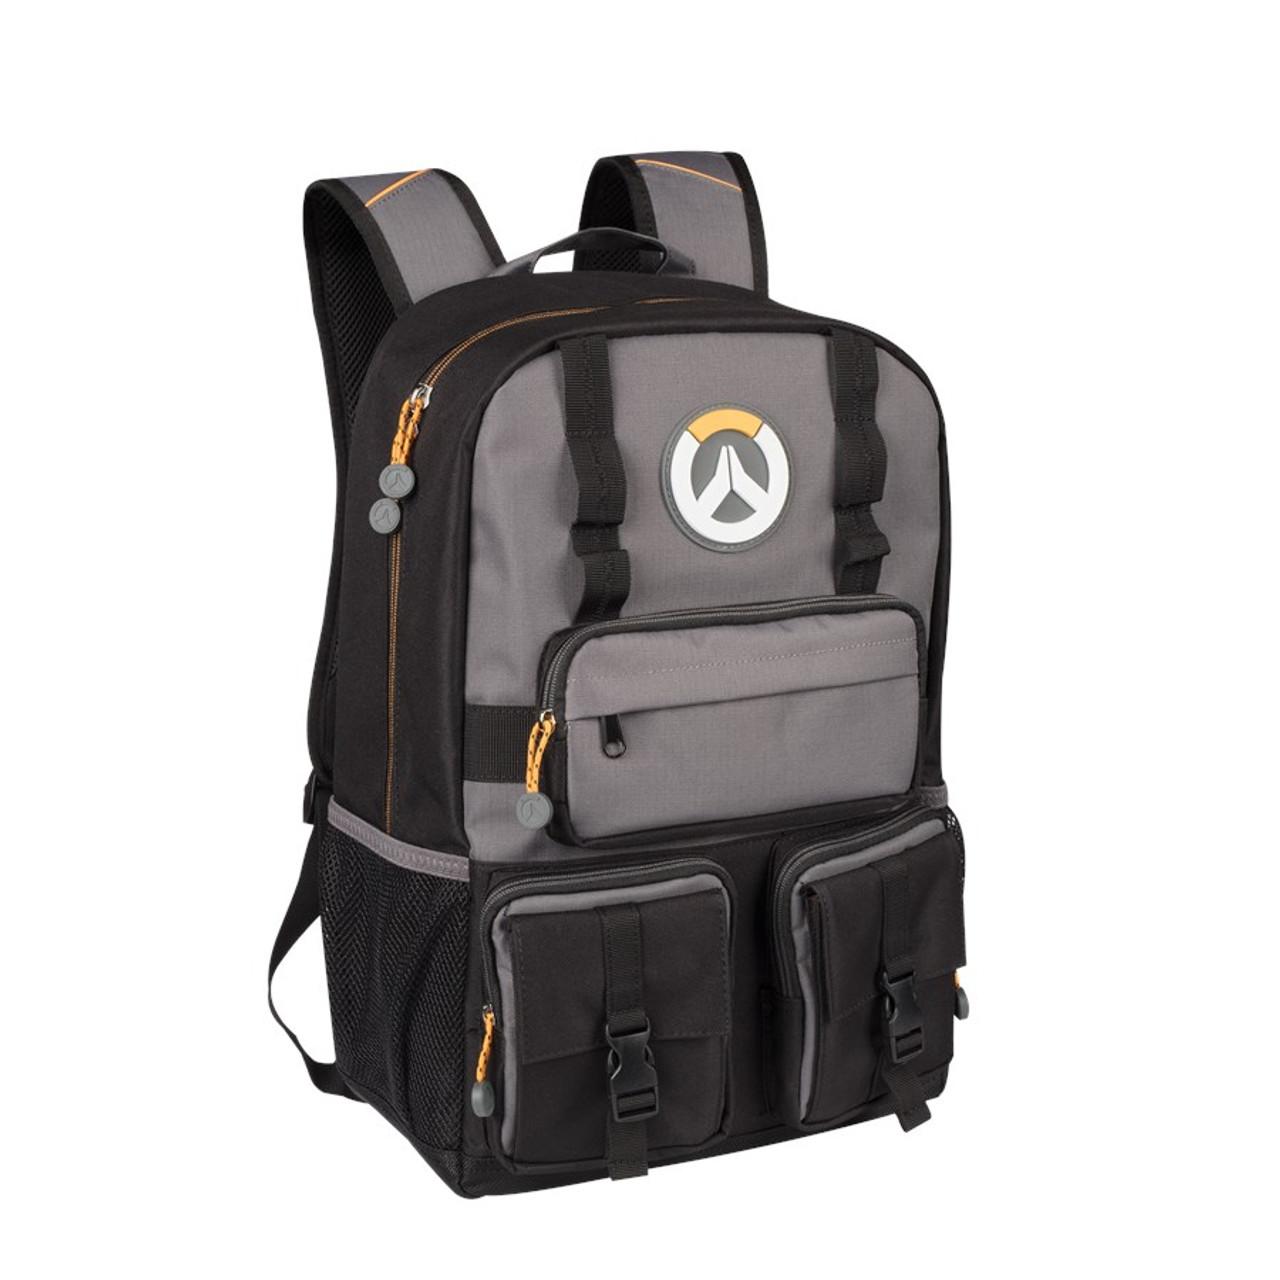 c7741528c1d Overwatch MVP Laptop Backpack - Videogamesnewyork